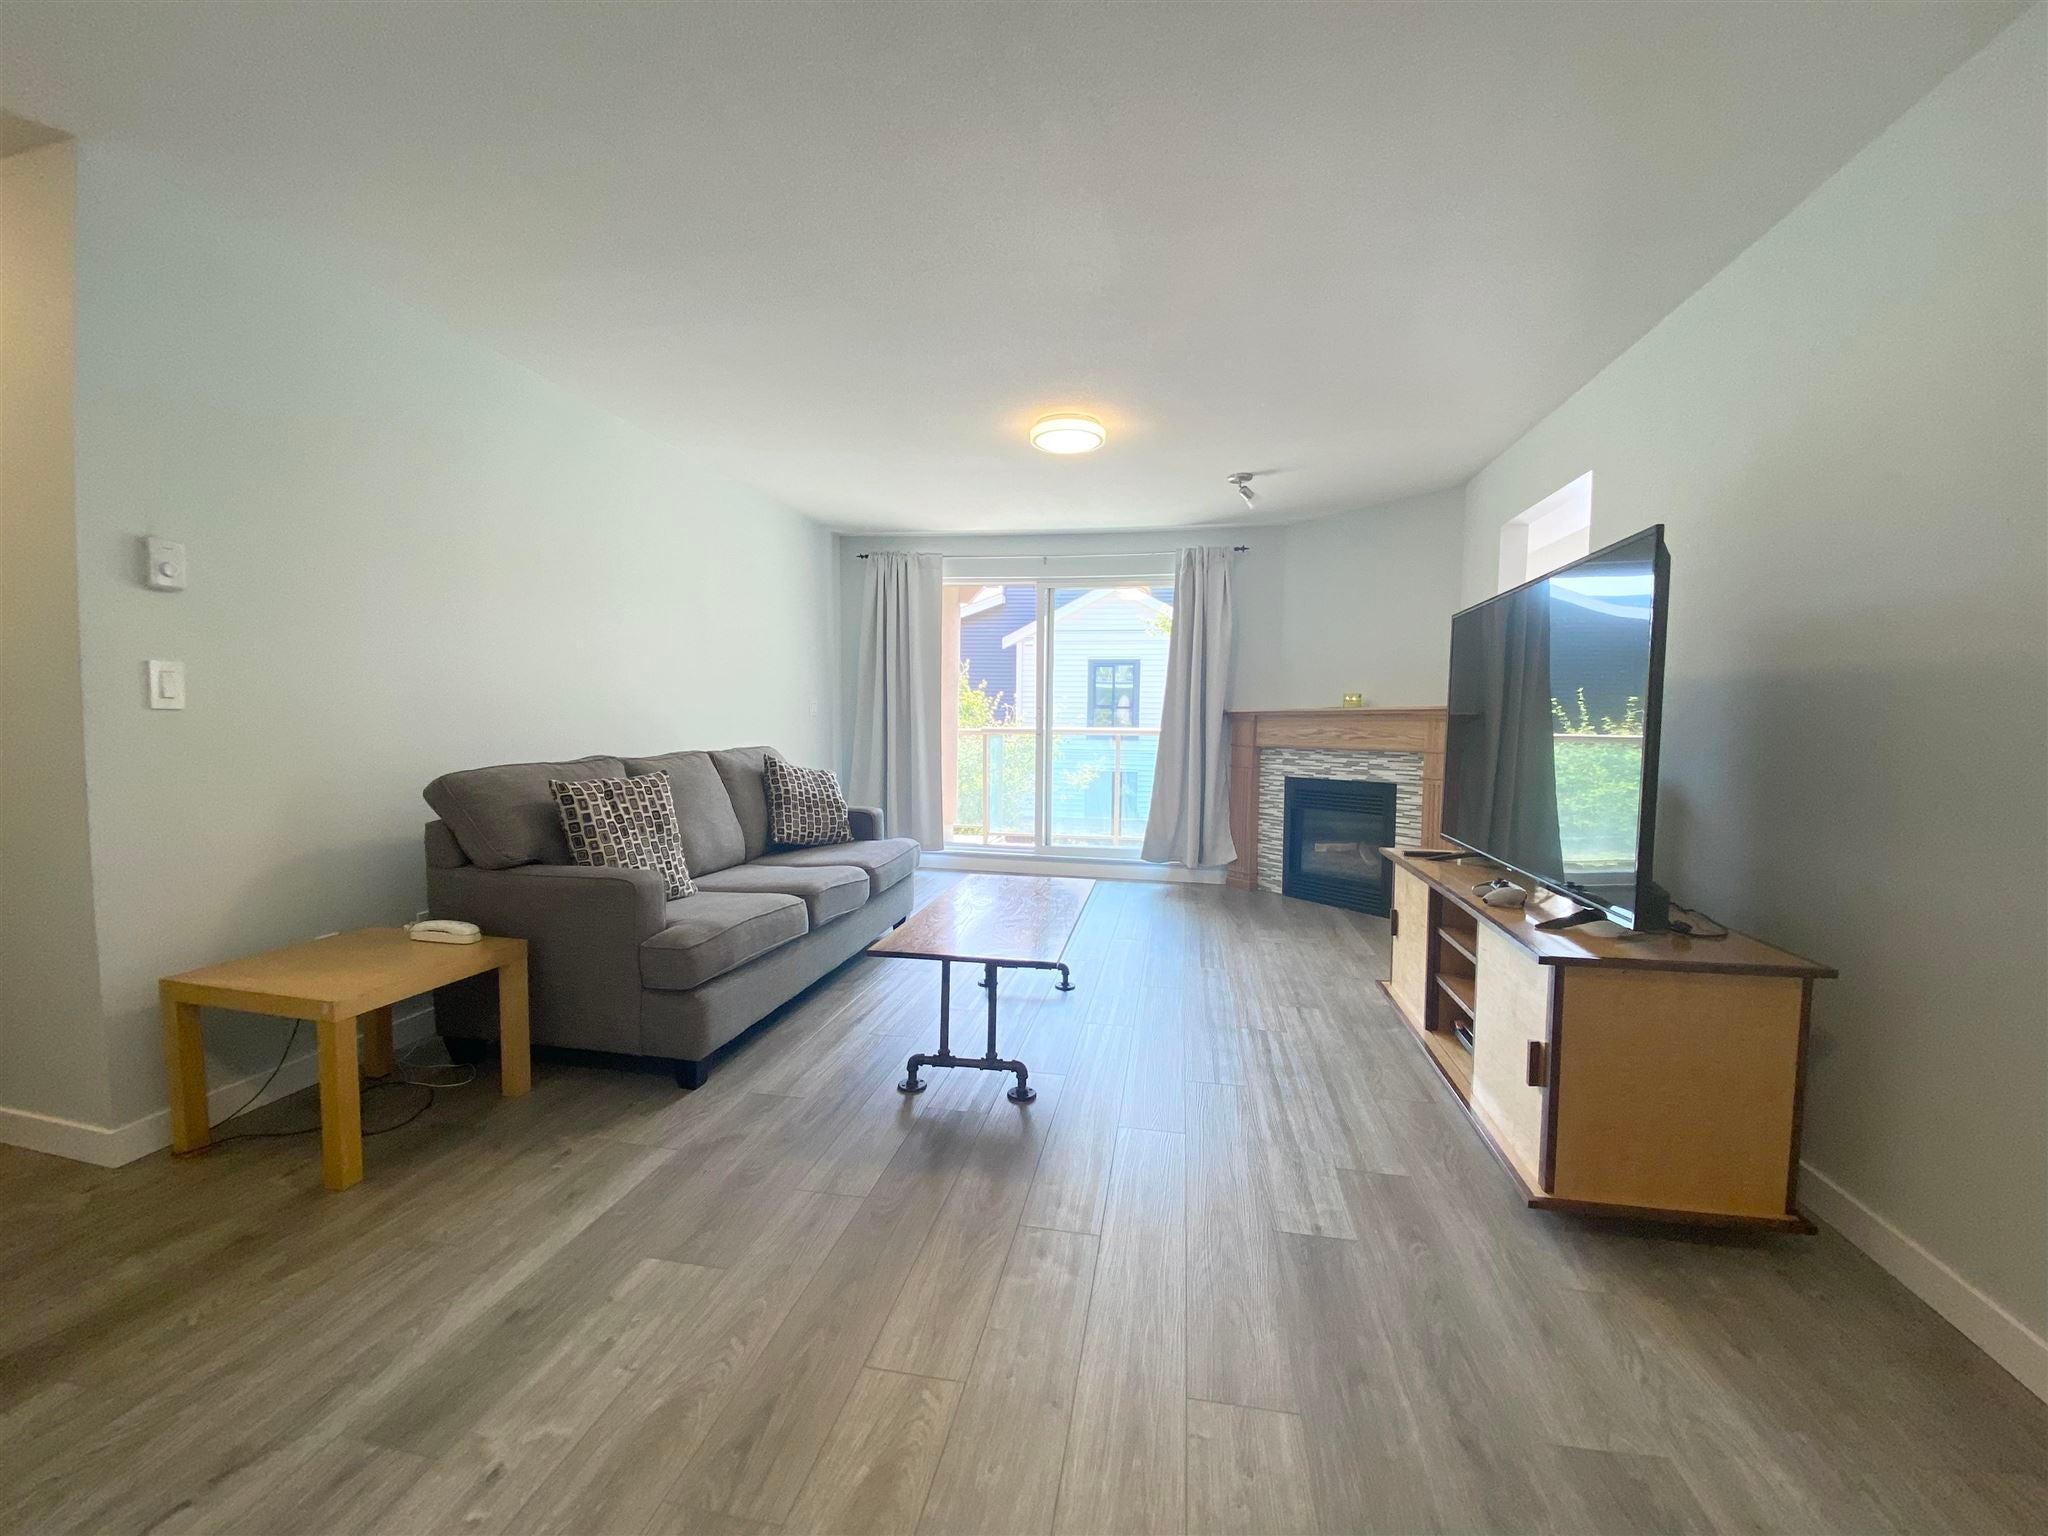 202 14981 101A AVENUE - Guildford Apartment/Condo for sale, 2 Bedrooms (R2606277)